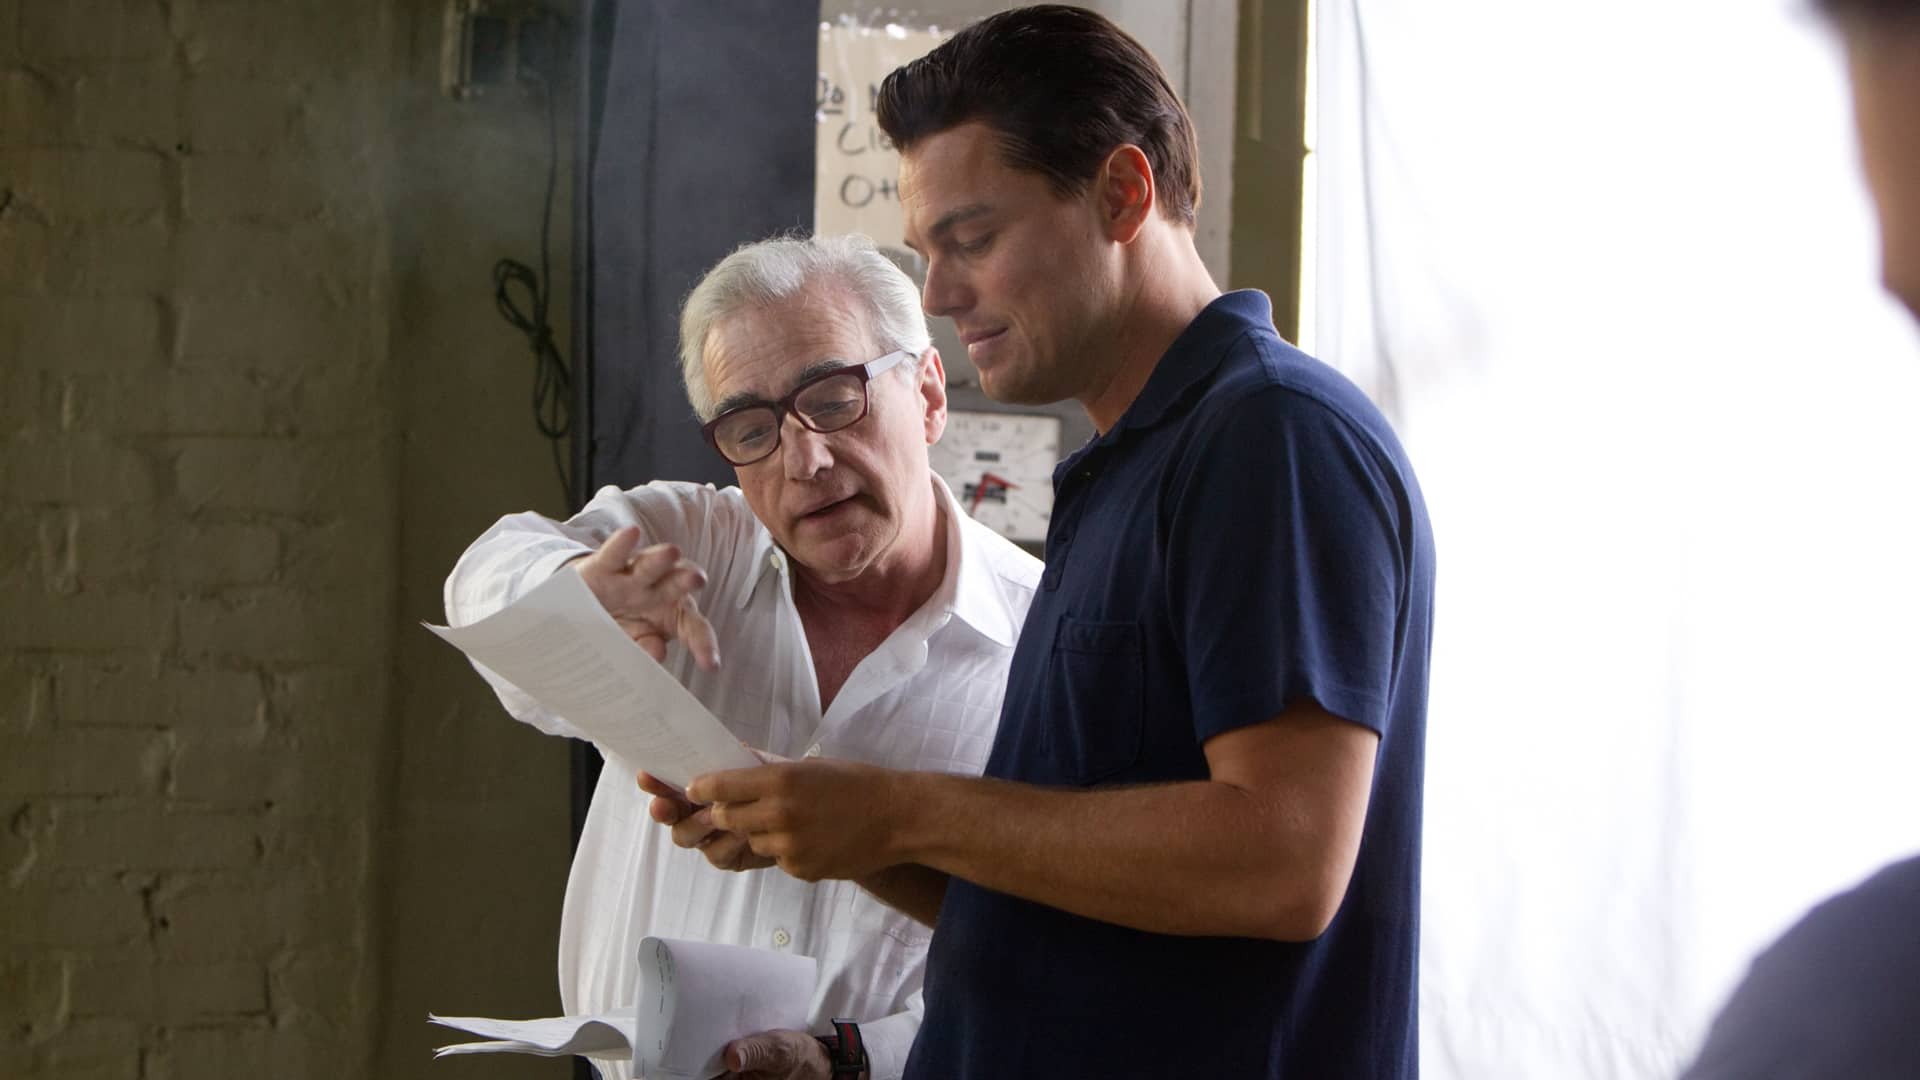 Martin Scorsese Movies and Directing Style - Header Image - StudioBinder